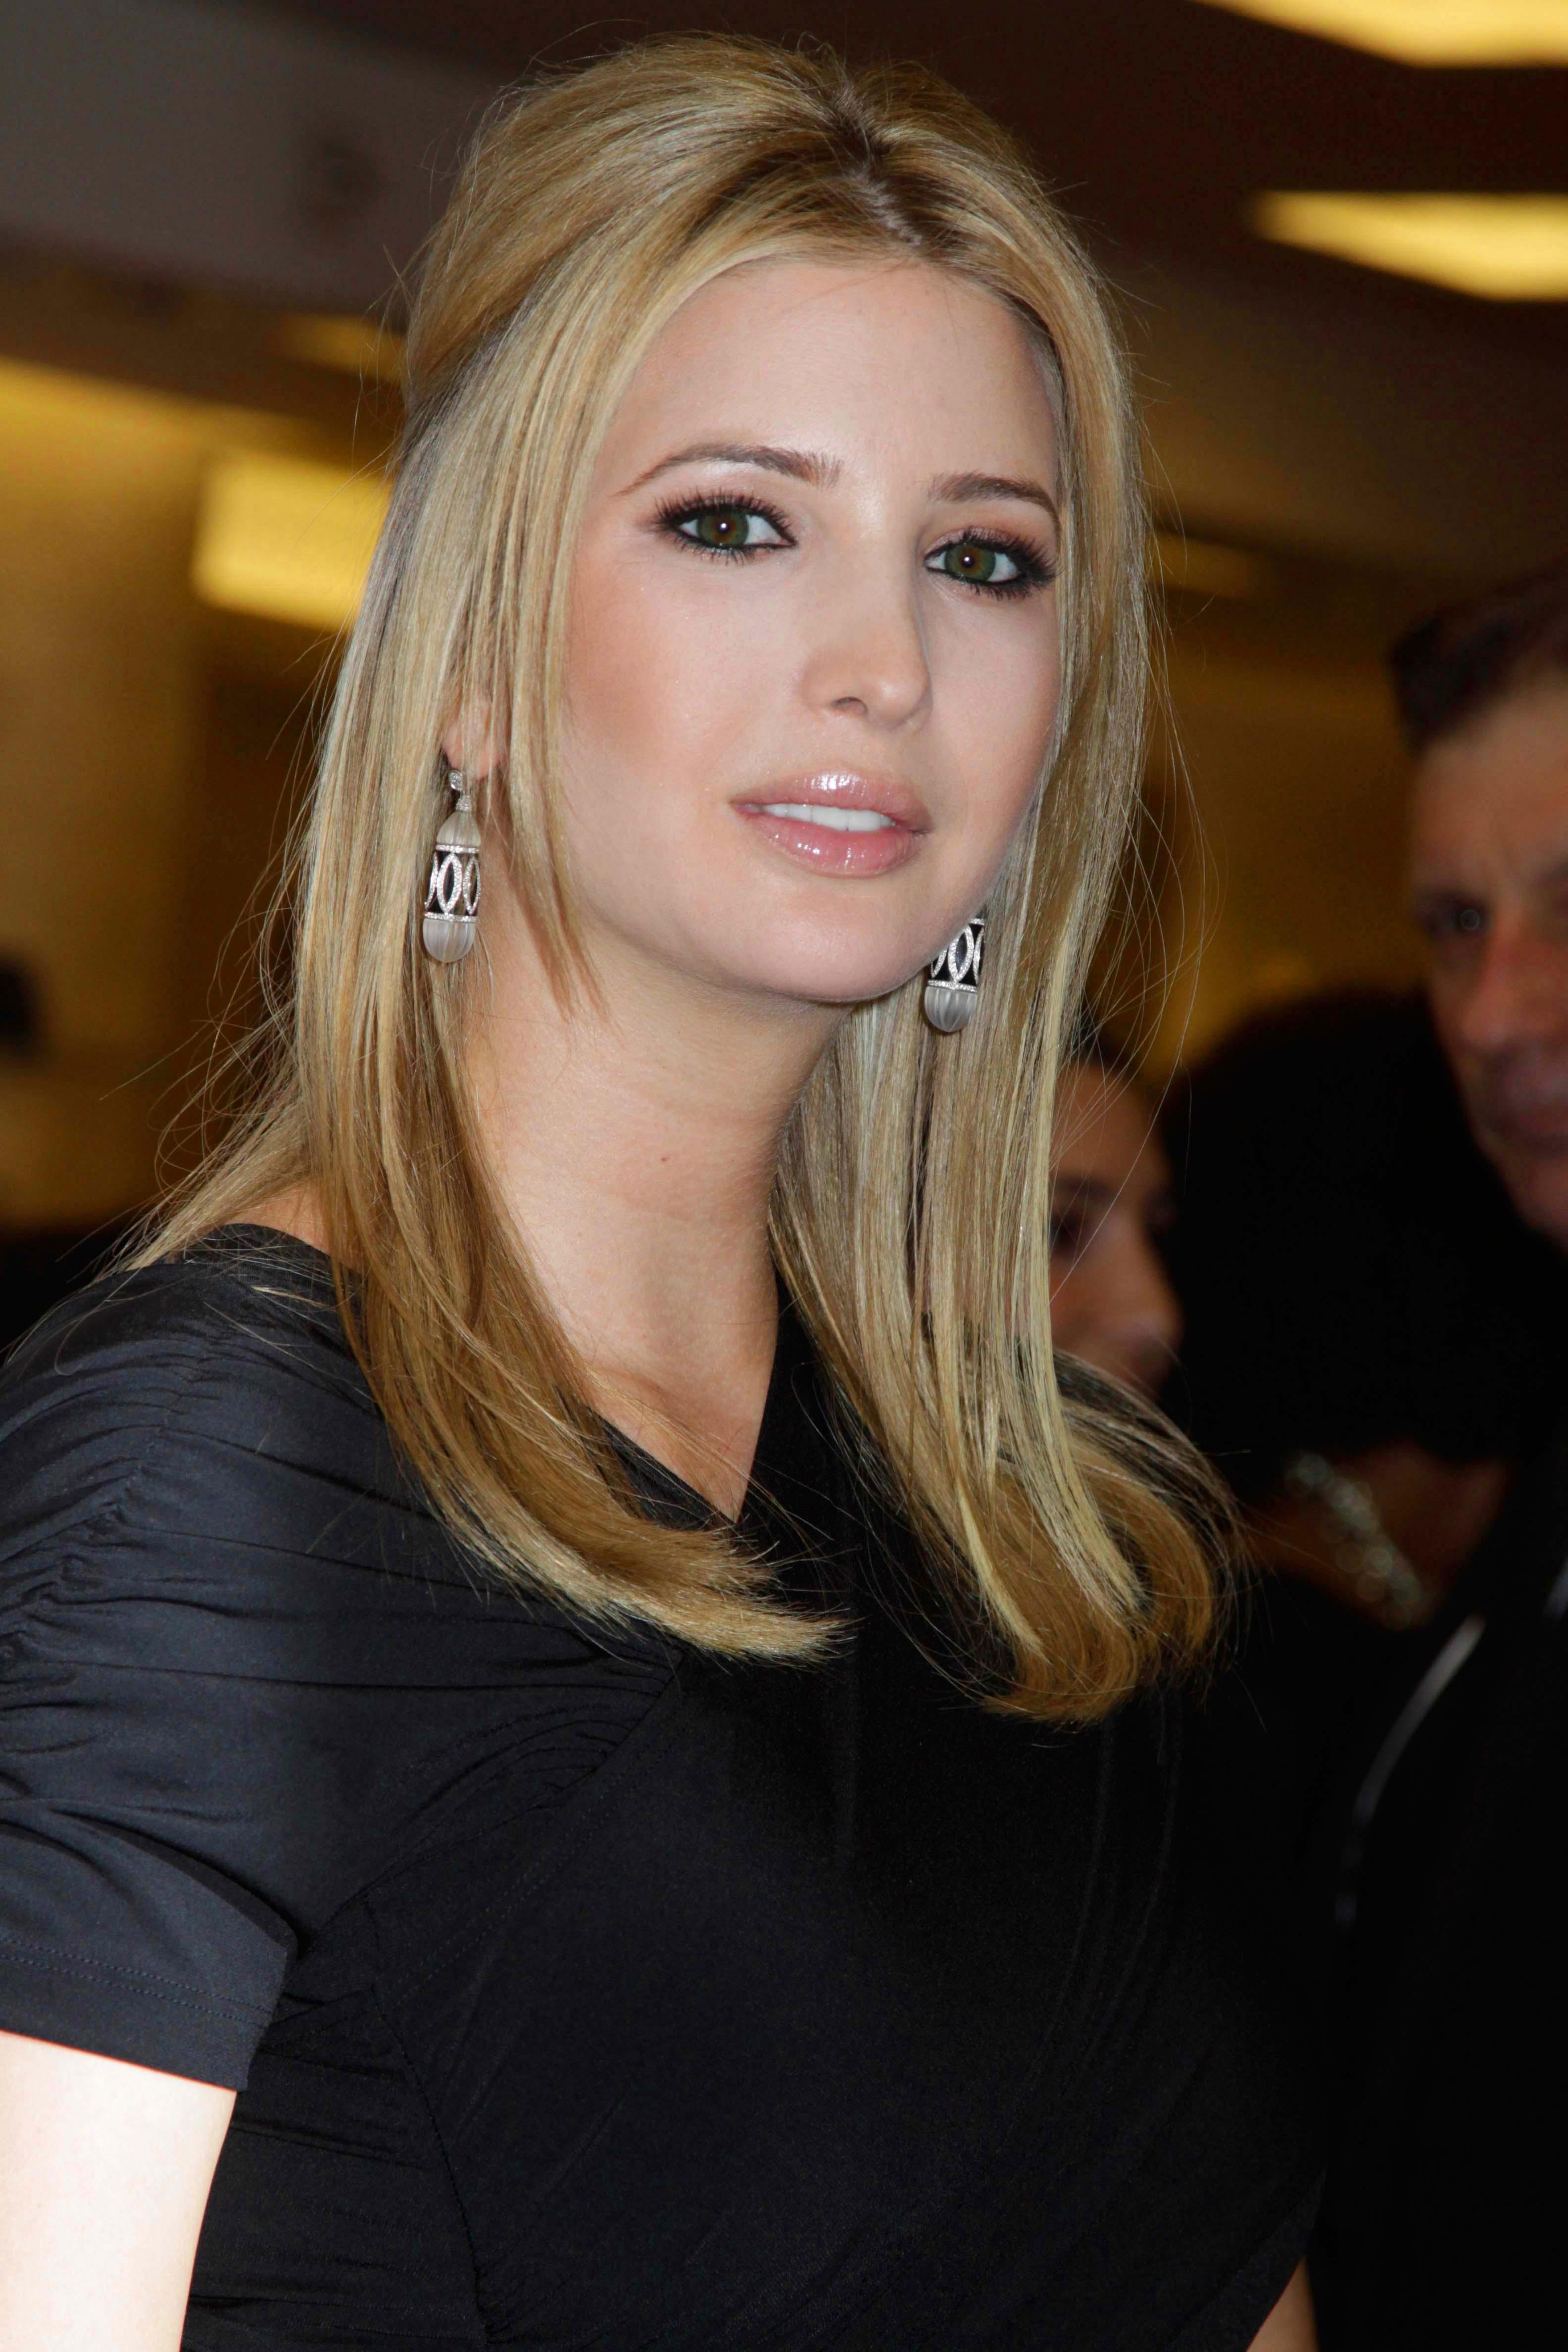 Ivanka Trump photo gallery - page #9 | Celebs-Place.com Ivanka Trump